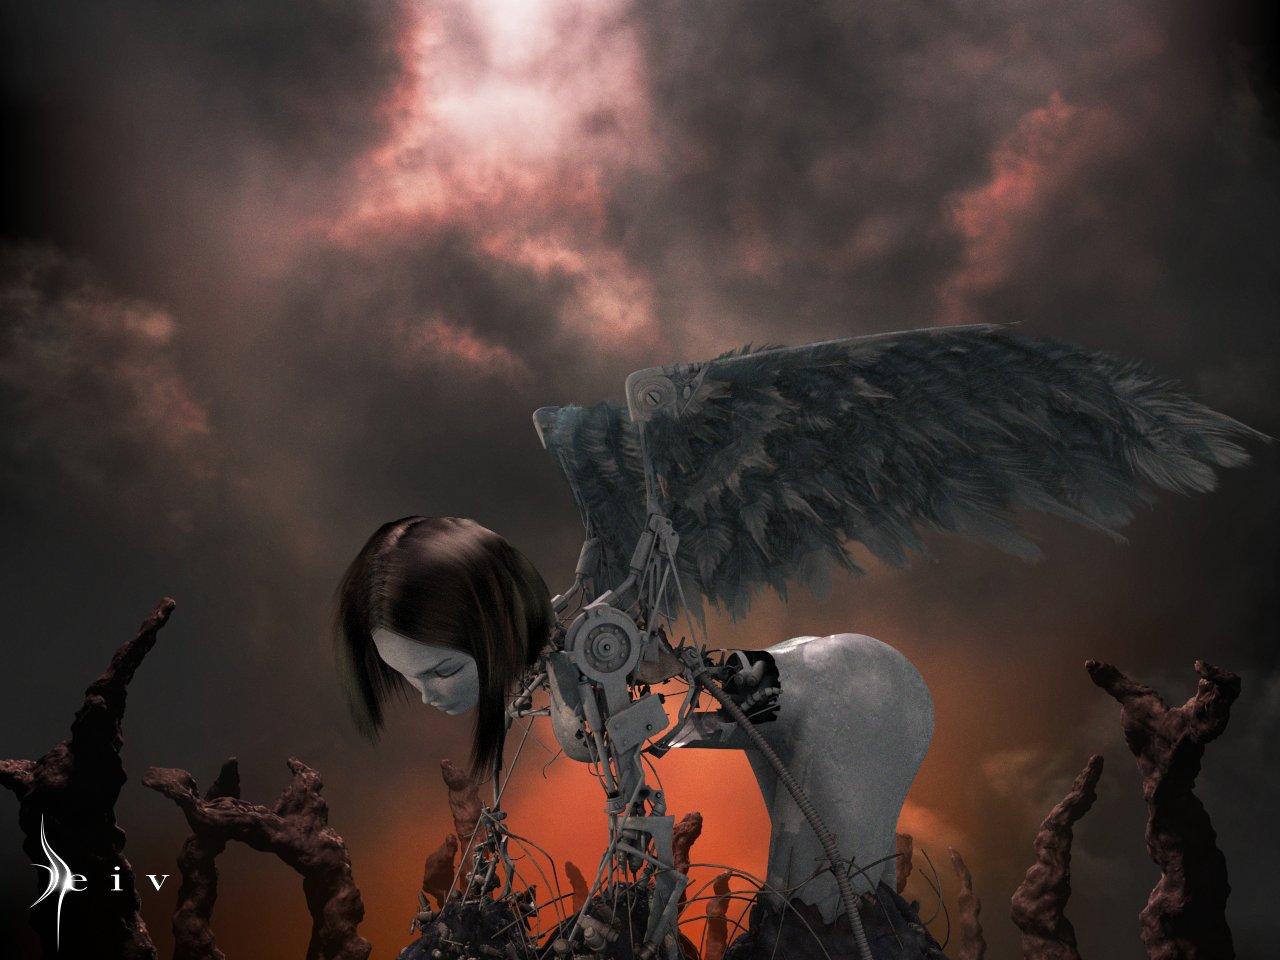 battle angel alita gally - photo #22